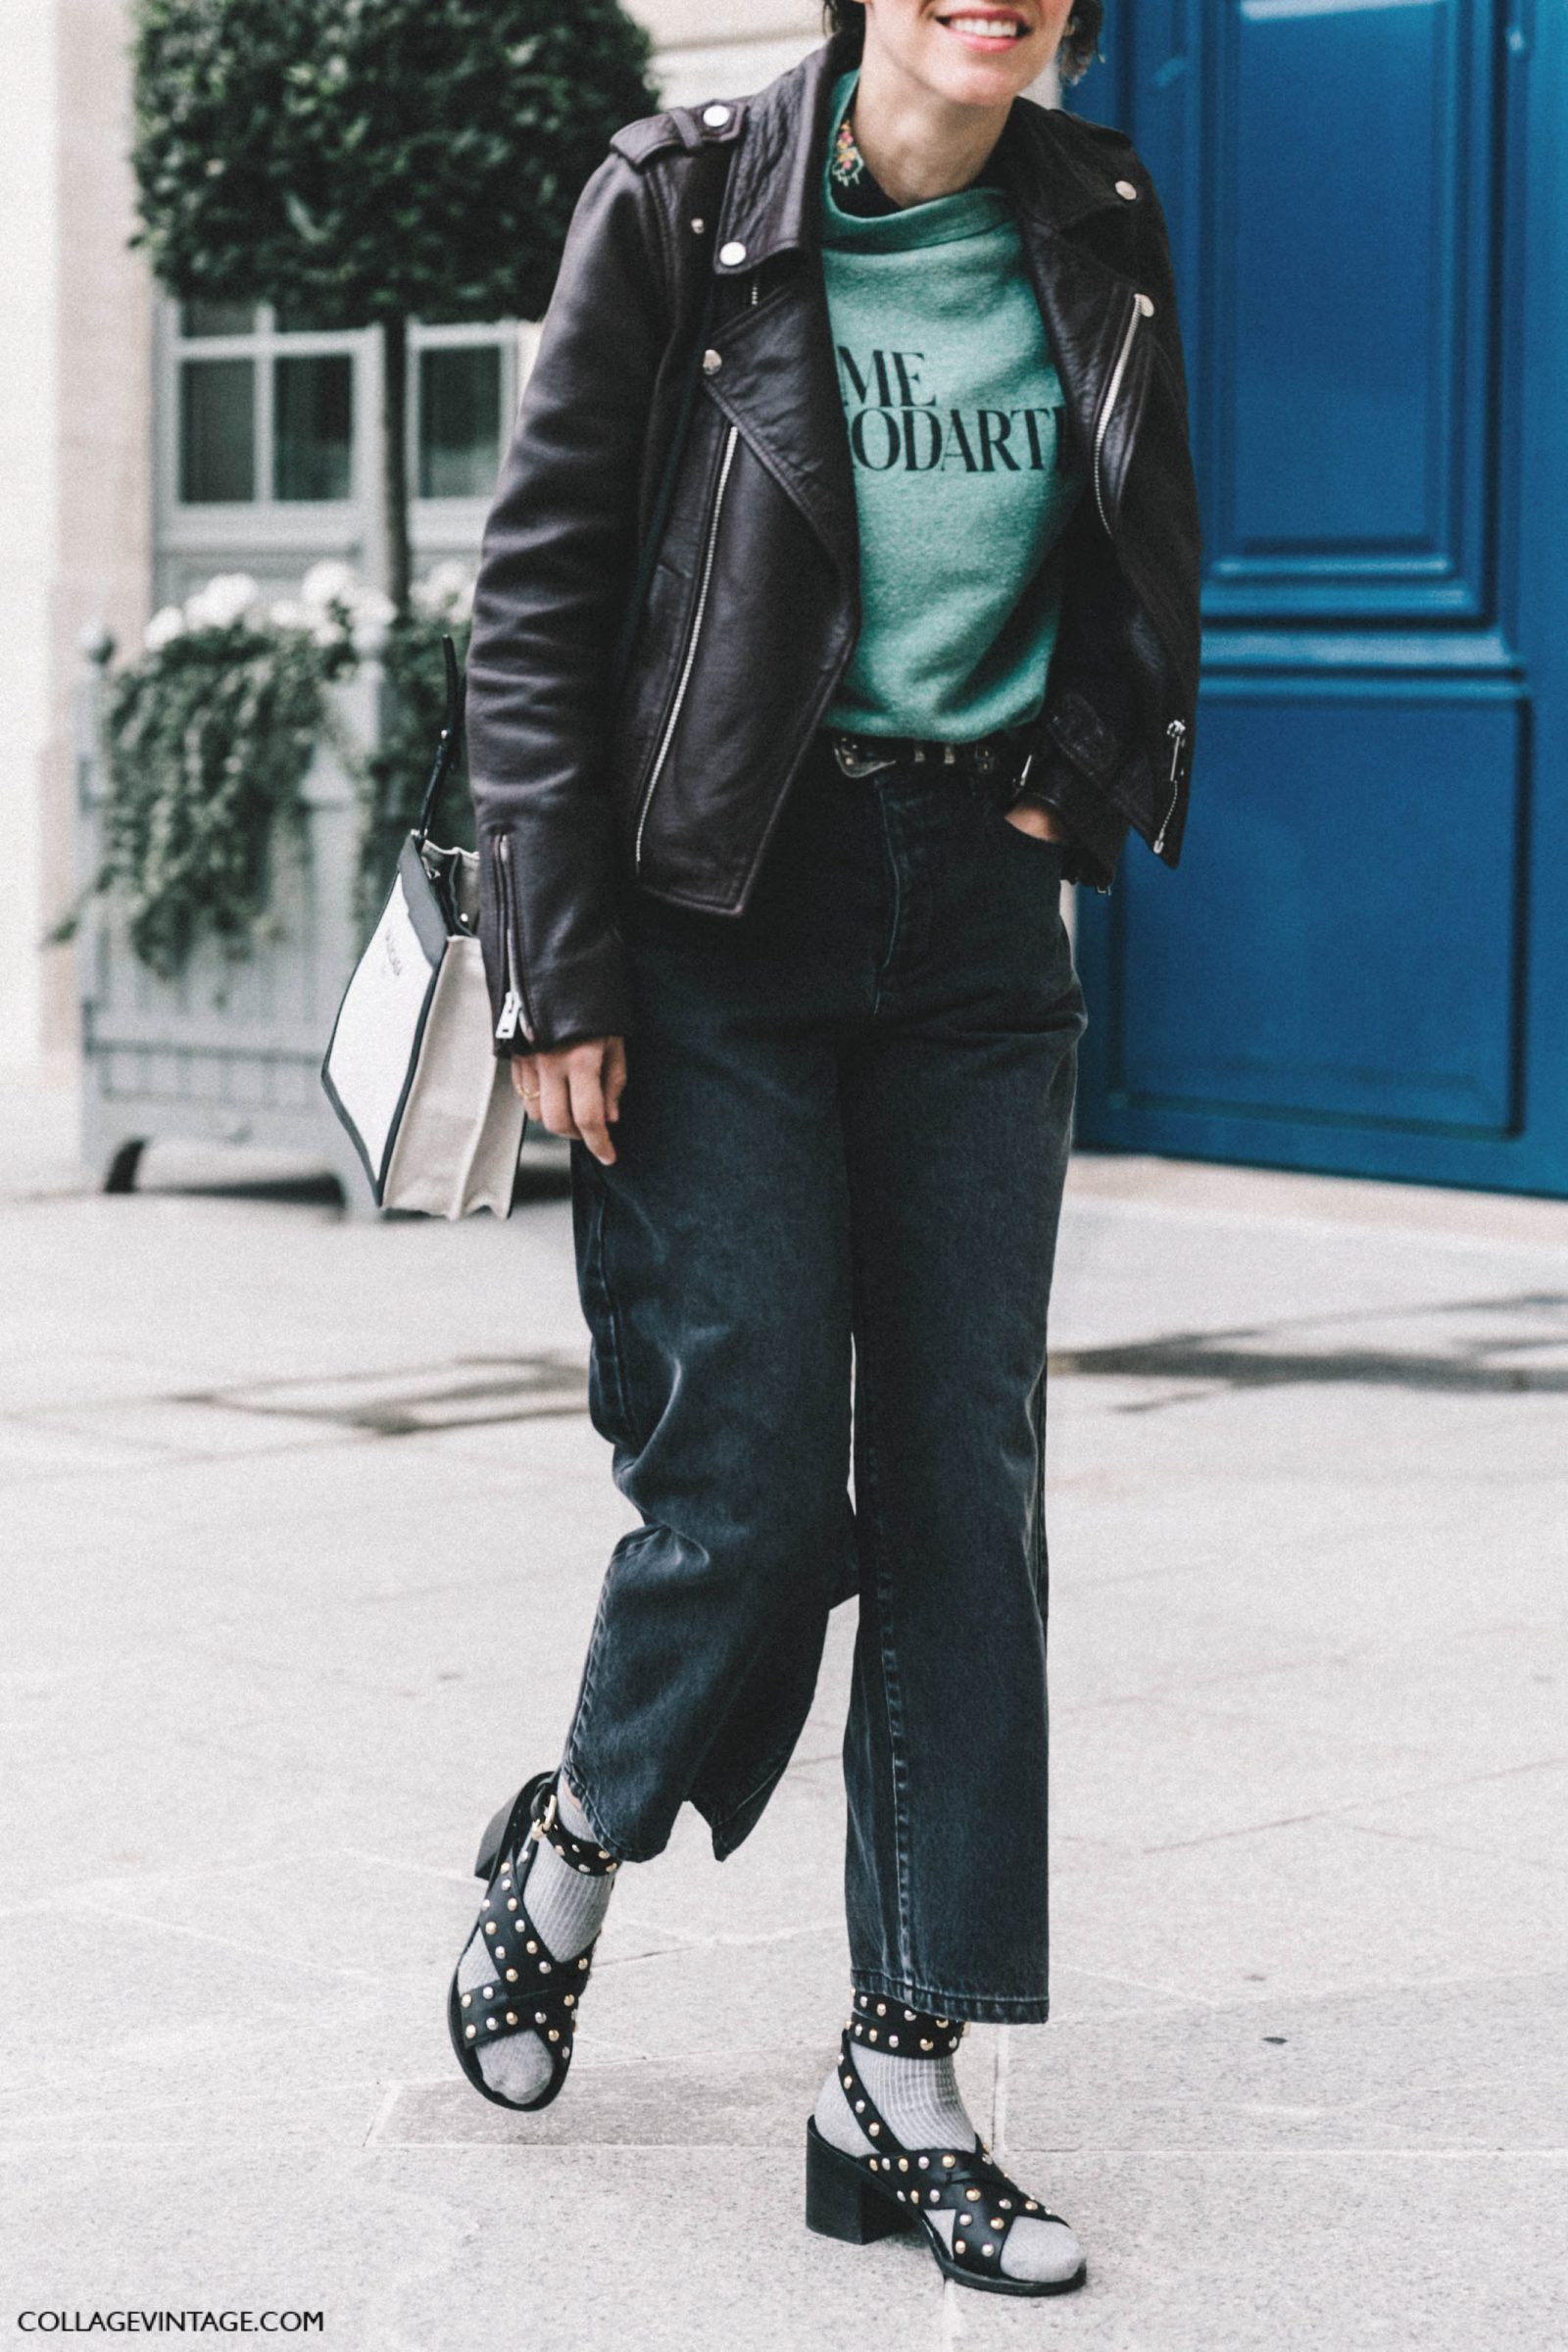 Paris_Couture_Fashion_Week-Collage_Vintage-Street_Style-26